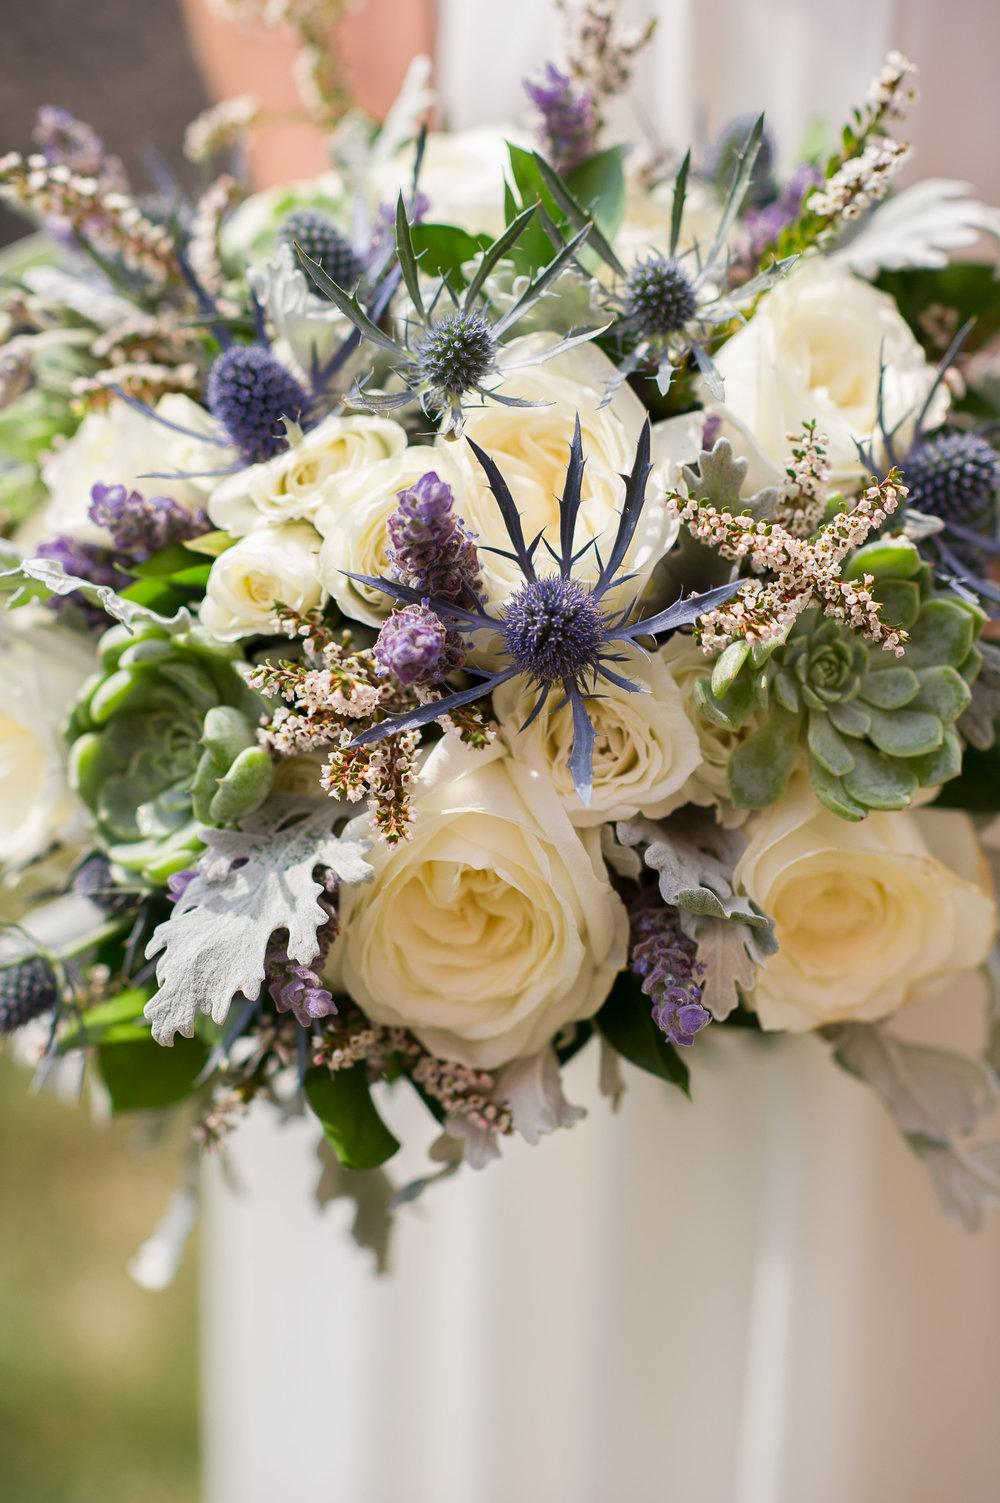 brandywine-wedding-tessie-reveliotis-photography-beautiful-and-blessed-events-008